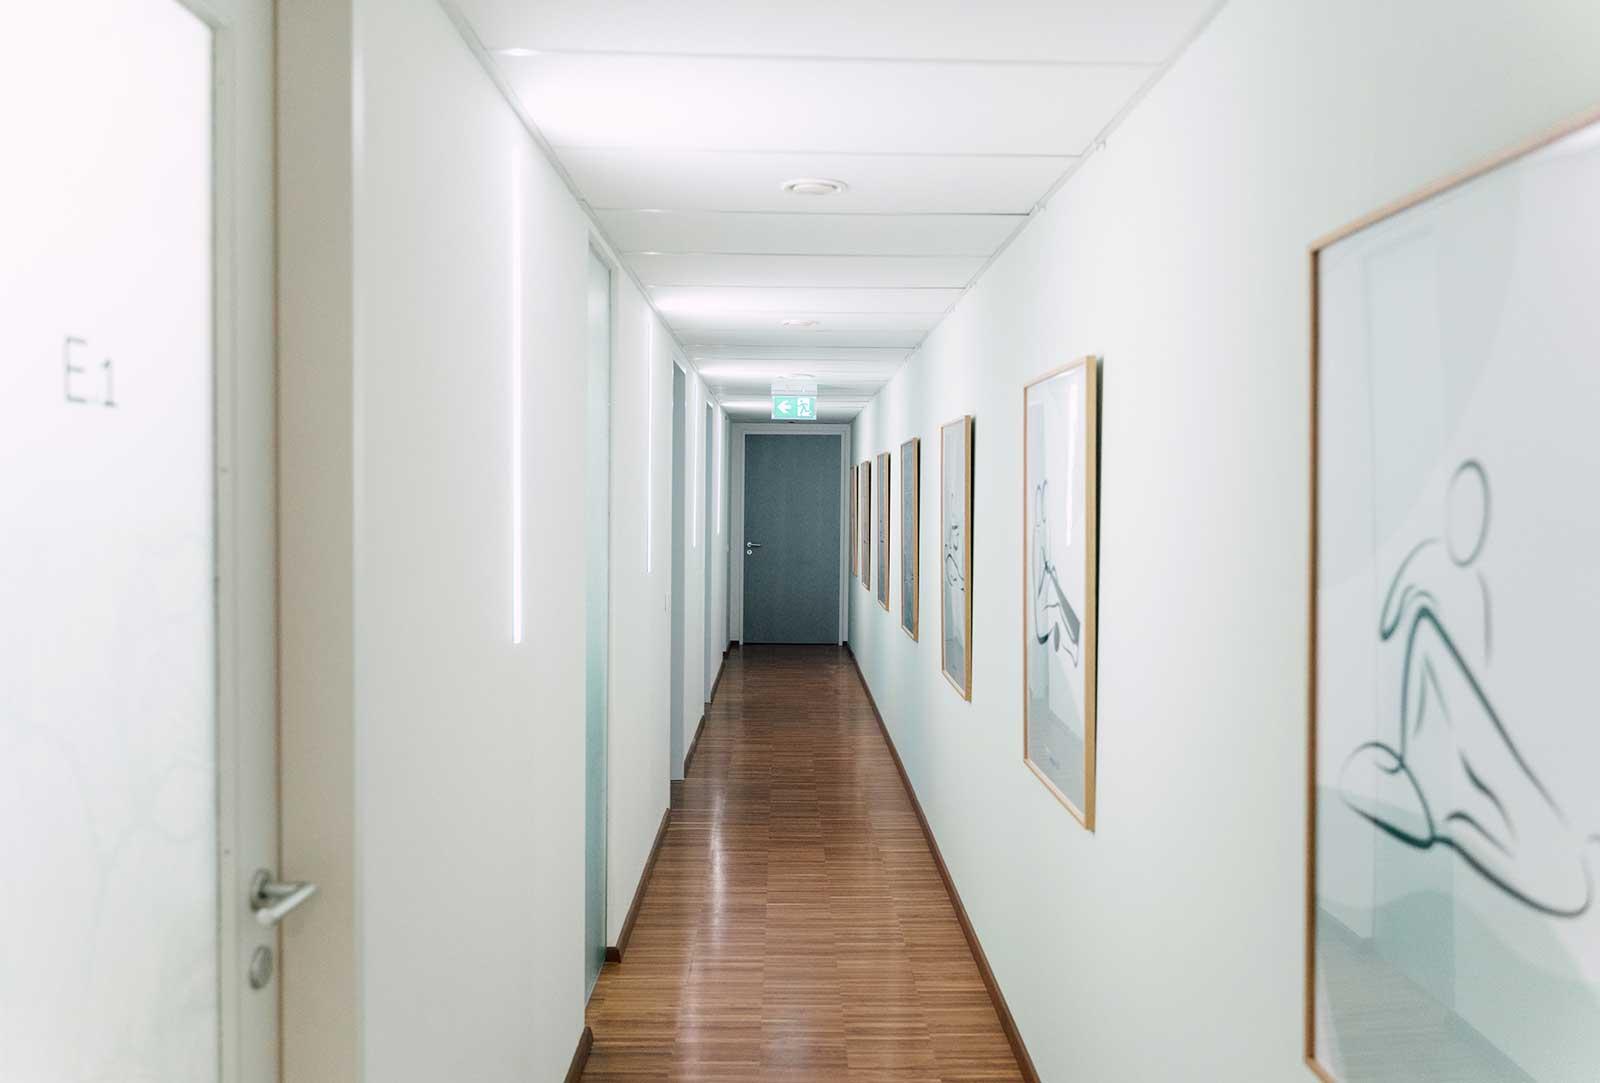 neues physiotherapiezentrum in Wien